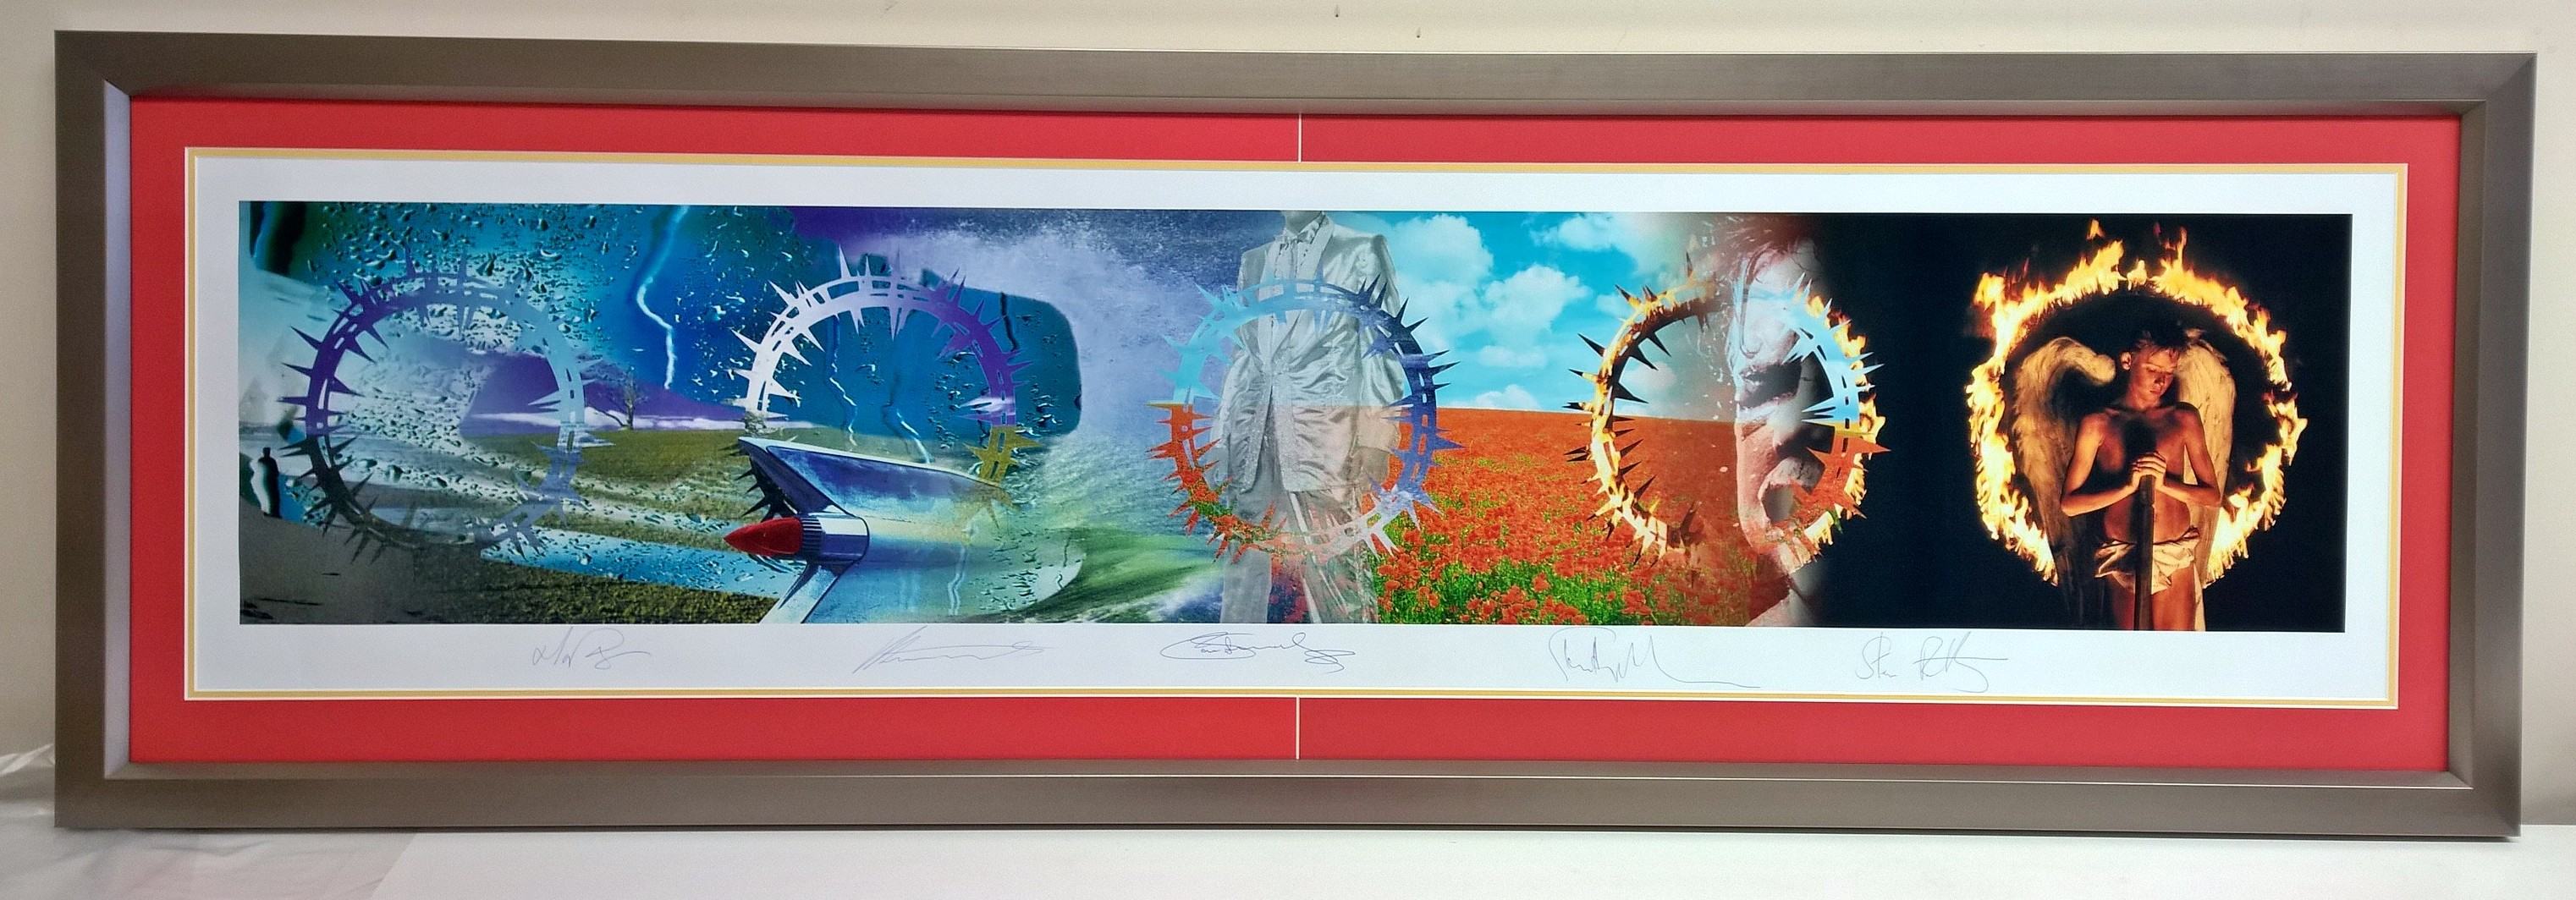 Huge 2000 x 450 Artwork